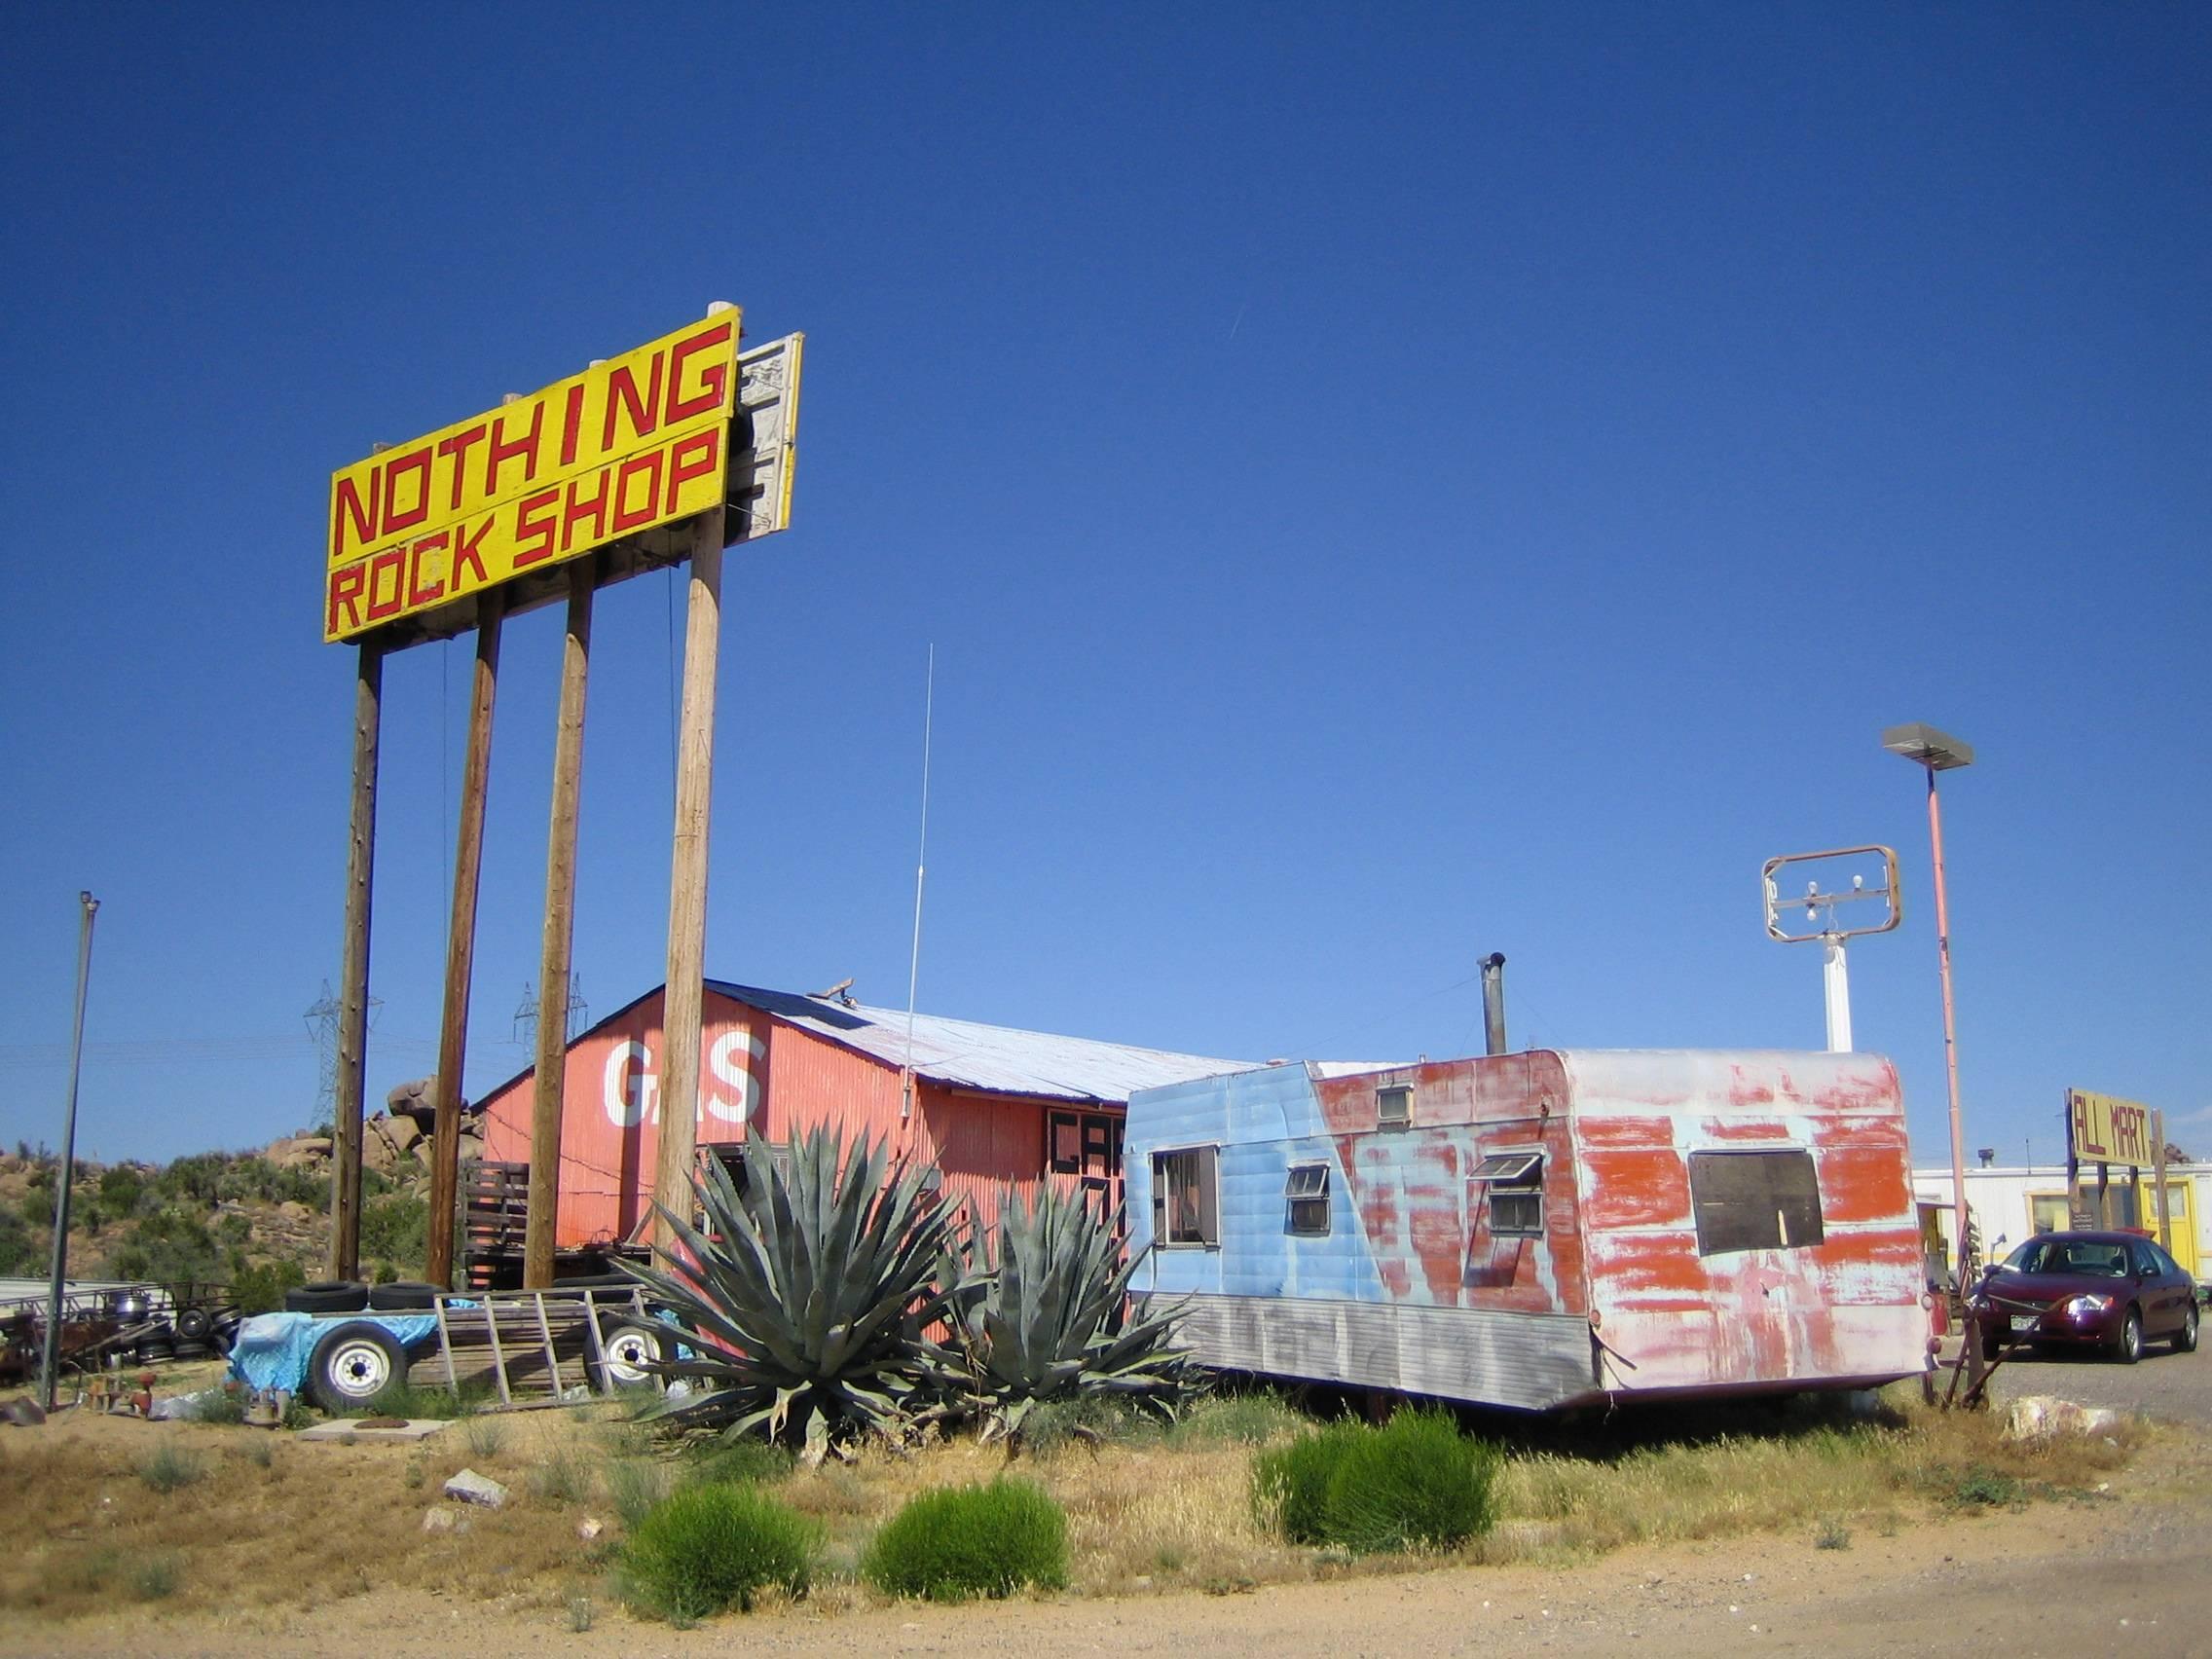 Nothing Rock Shop